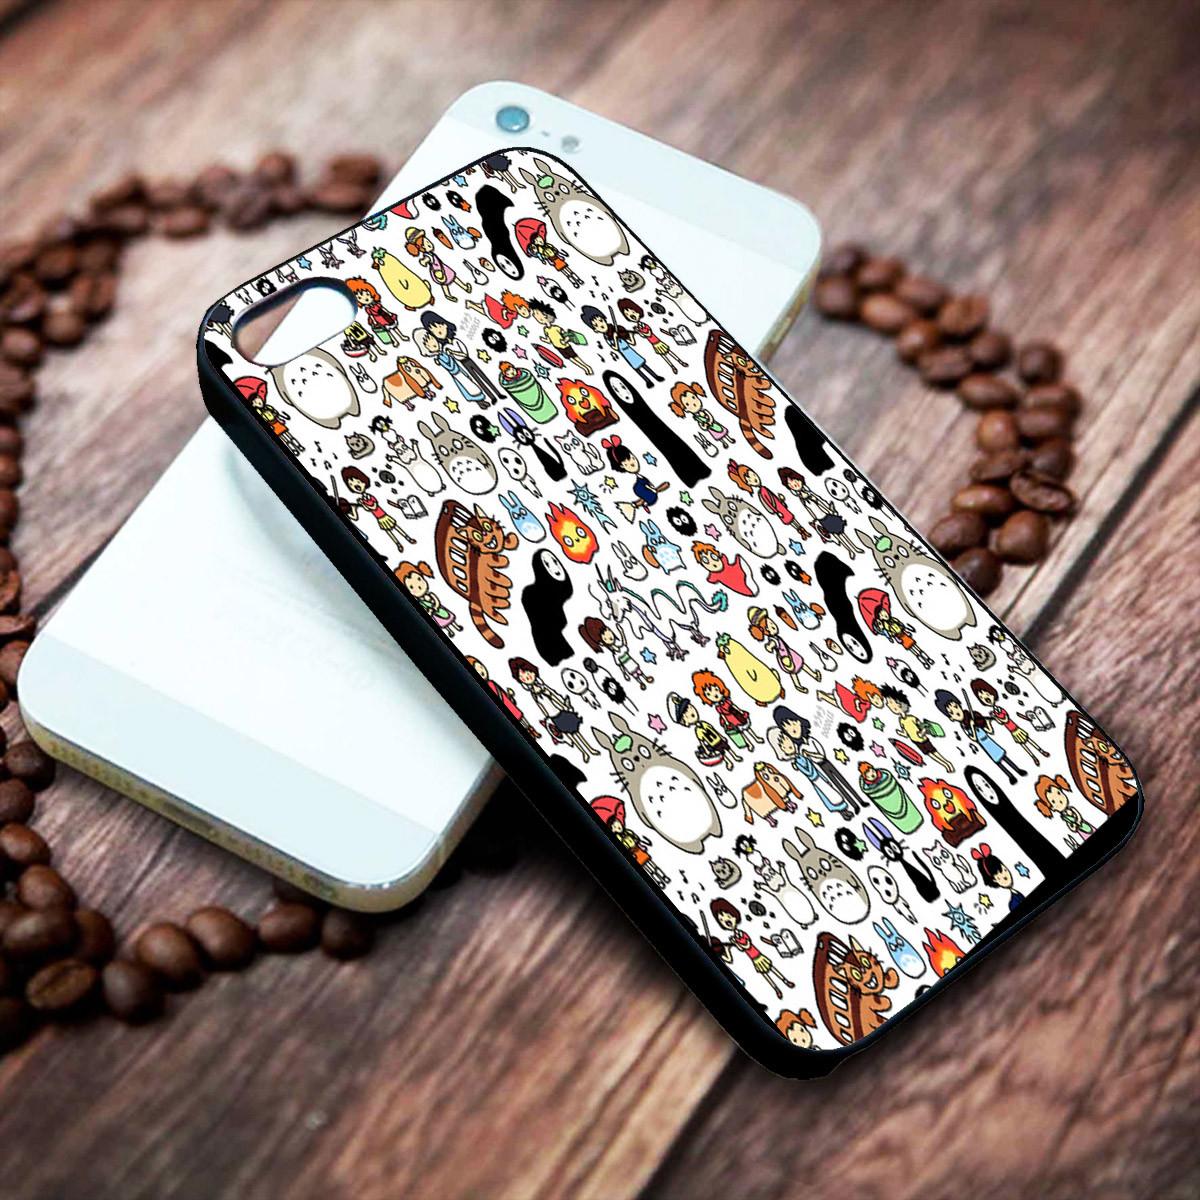 Kawaii iPhone 6 /5/5s/5c/4/4s case